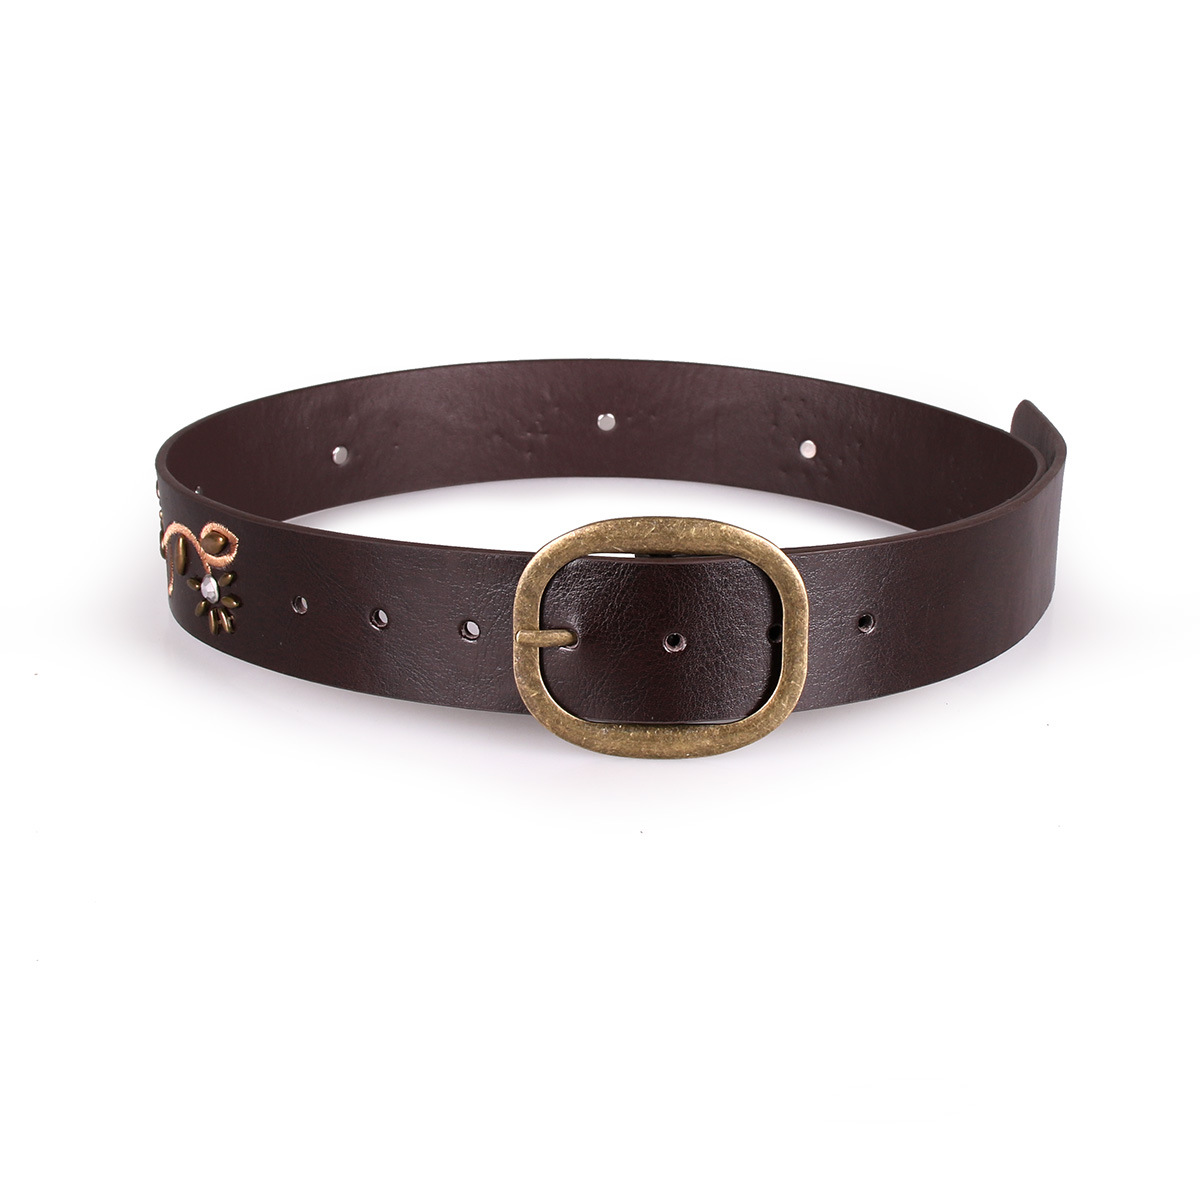 2018 Best Sale New Women Lady Fashion Metal Fhin Gold Buckle Skinny PU Leather Waistband Belt woman belts for dress SE23